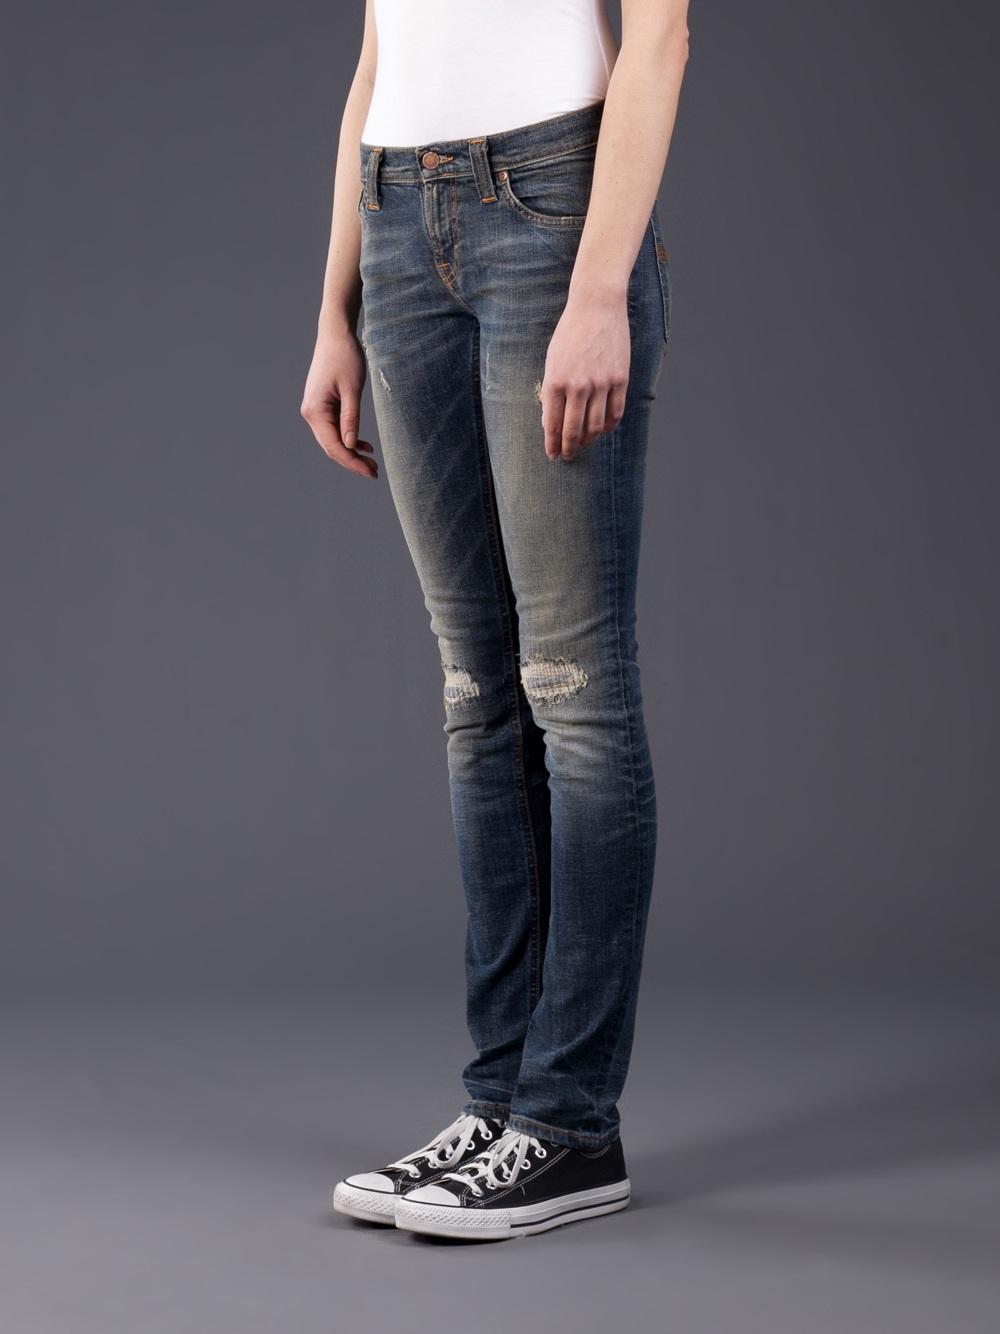 Lyst - Nudie Jeans Tight Long John in Blue f24c77351